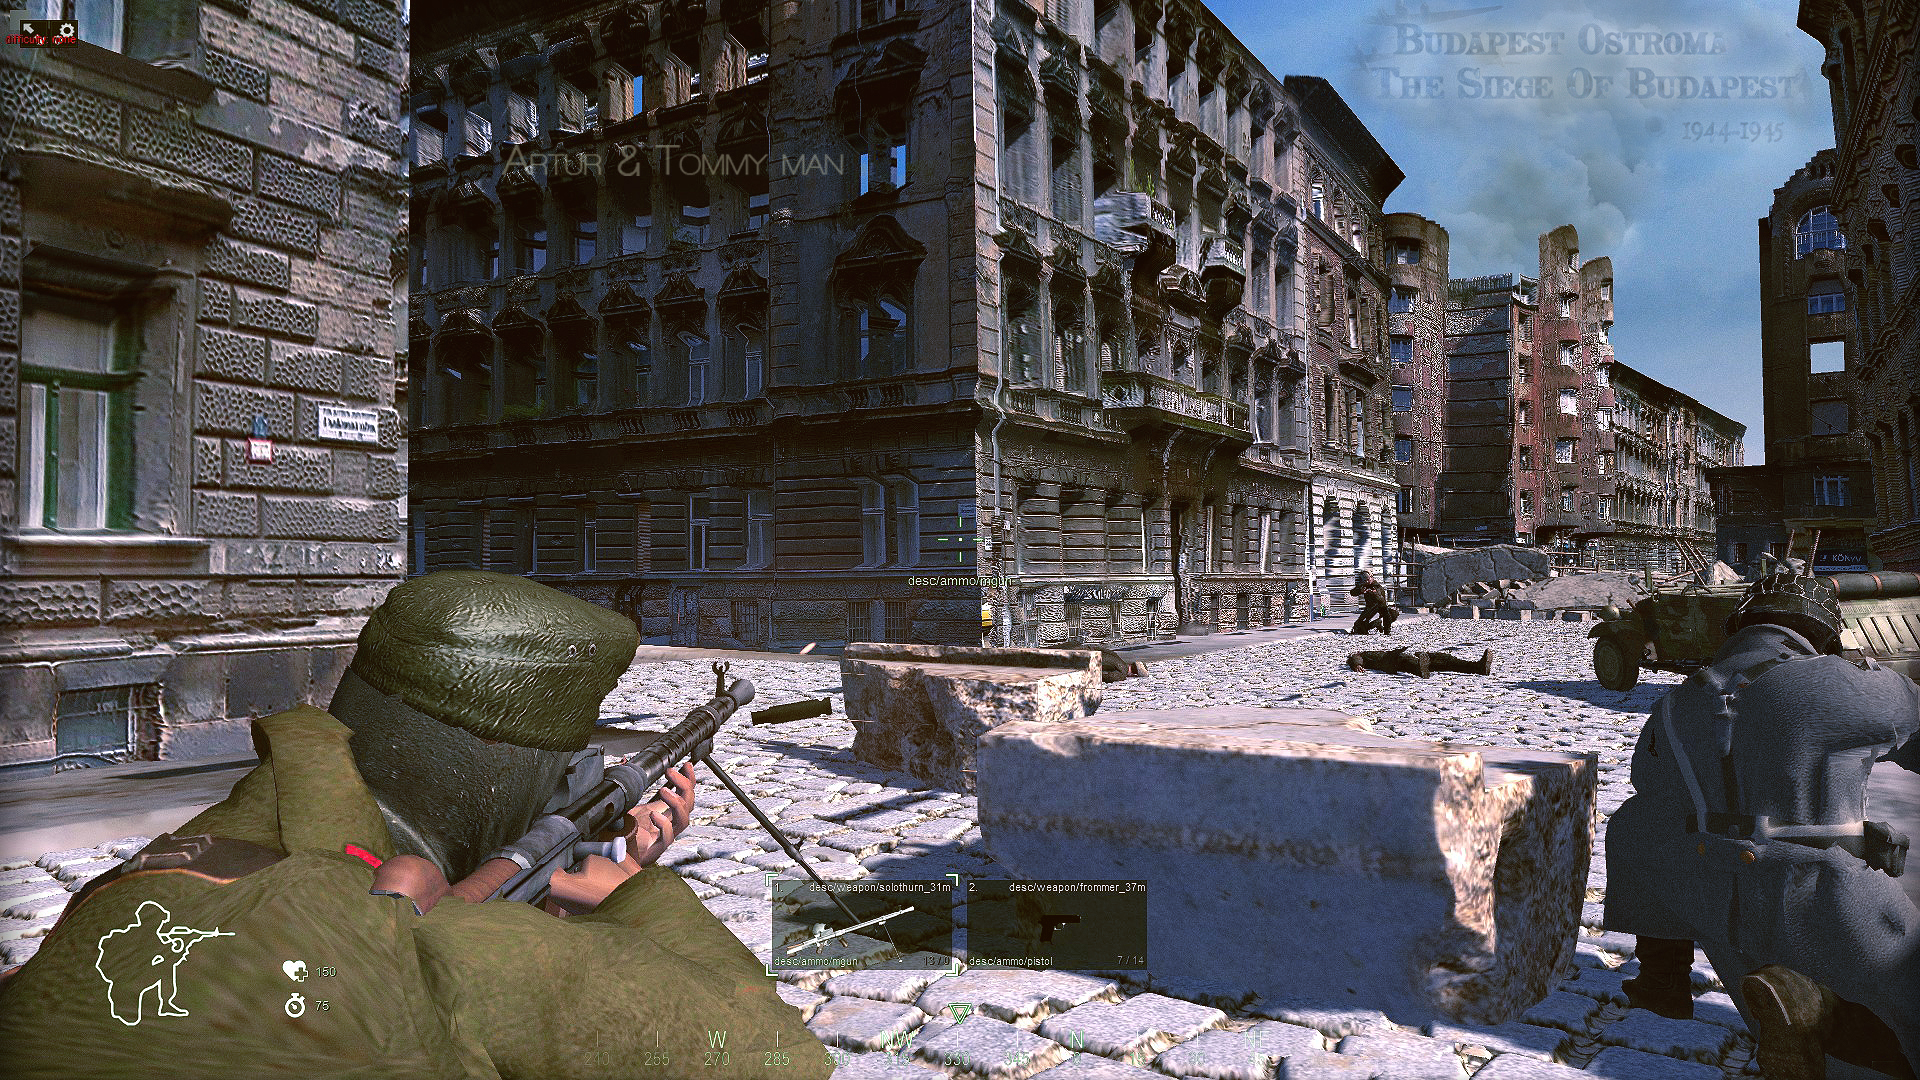 Budapest ostroma,1944-45,Mod,game,Jatek,Update,